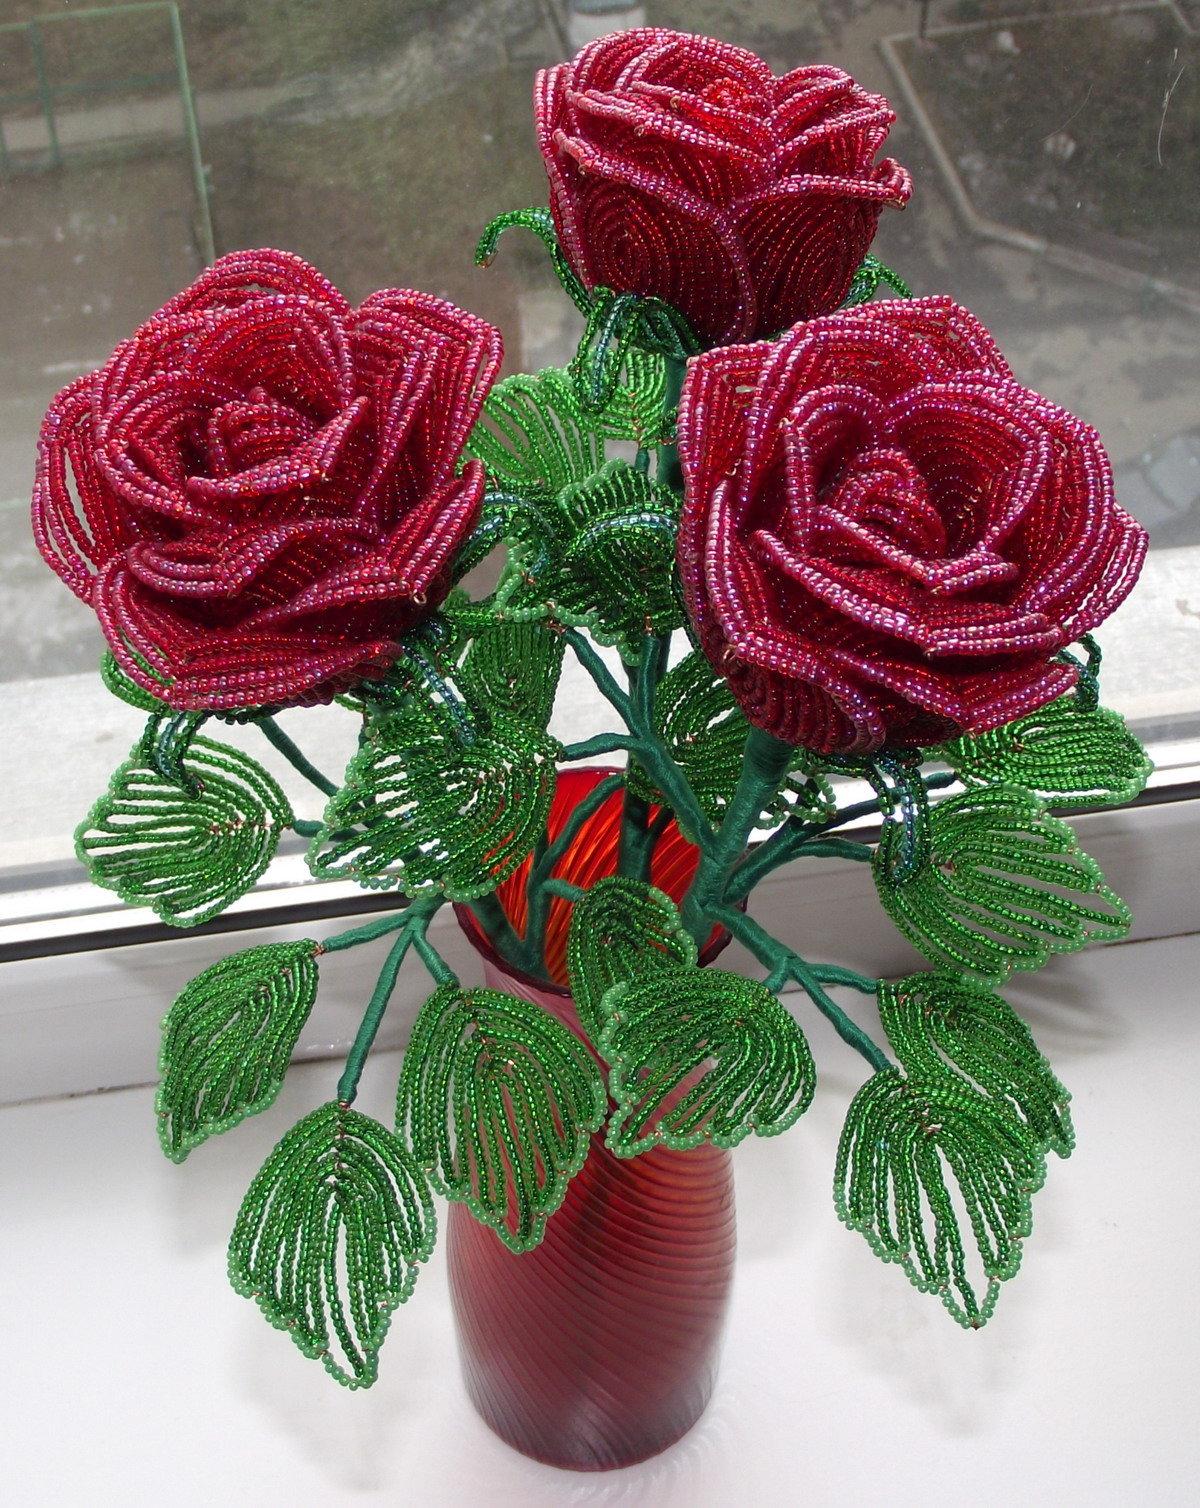 композиция роз из бисера фото присутствии японского минимализма